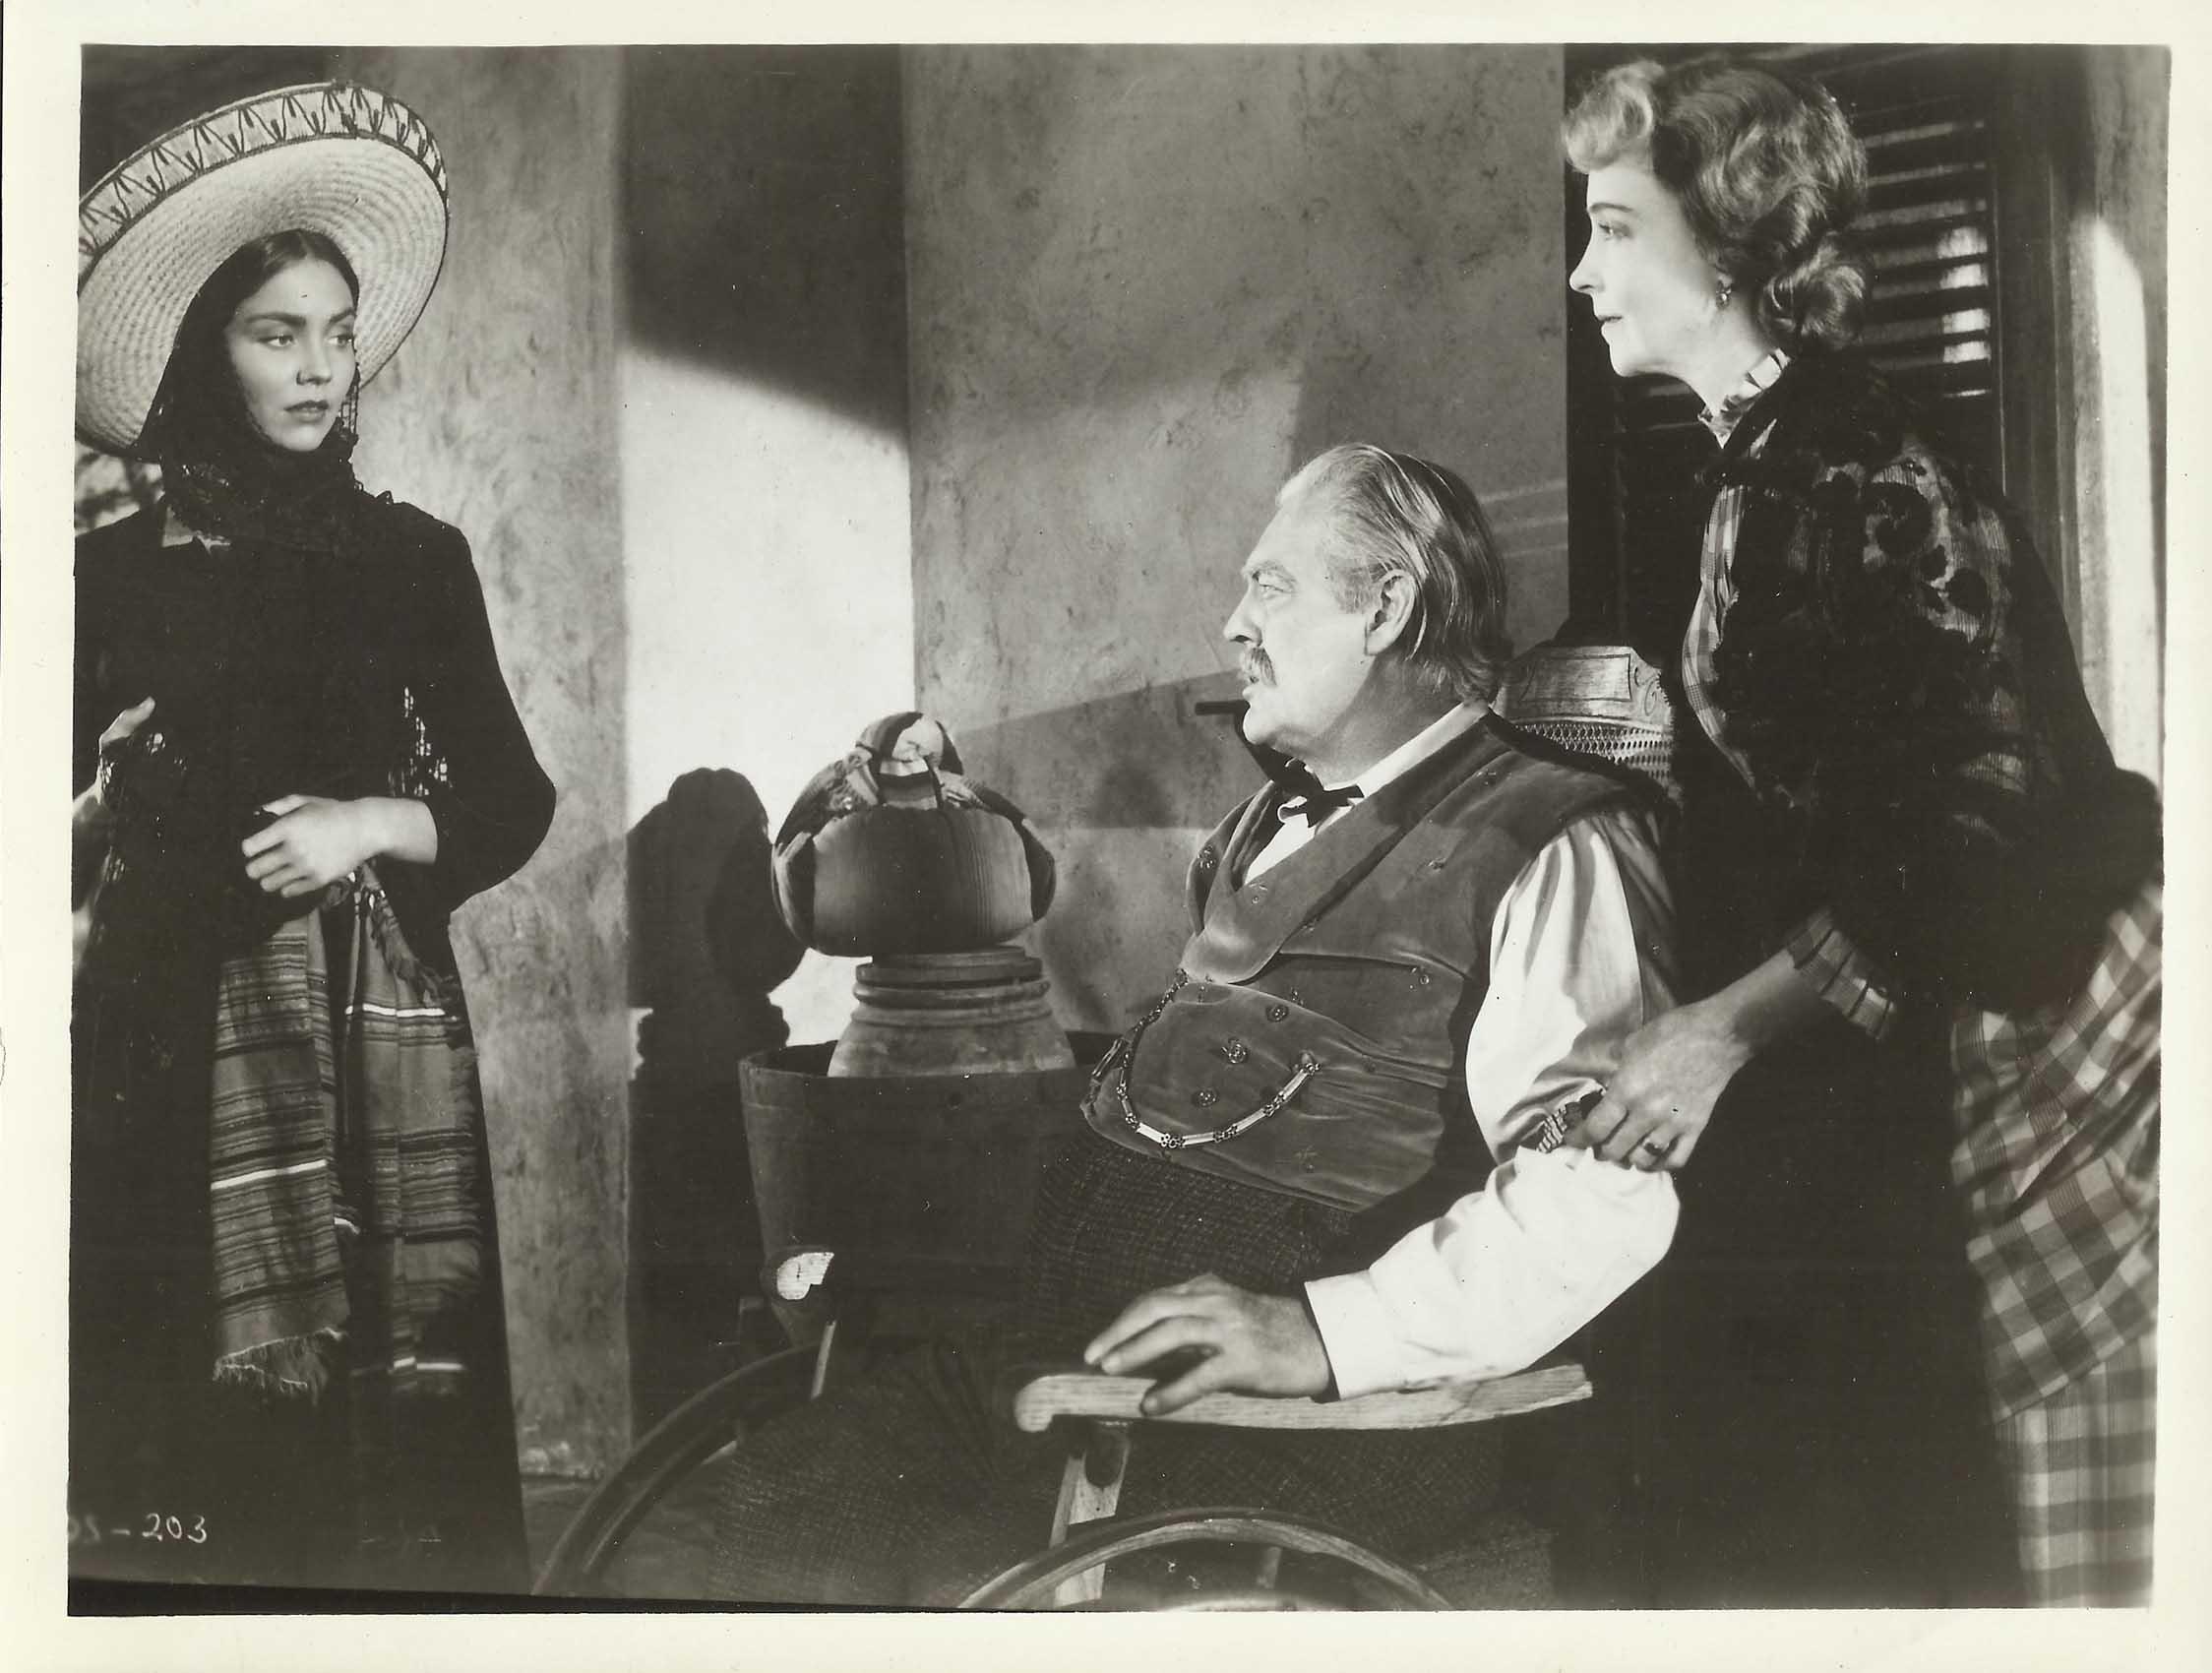 Lionel Barrymore Backgrounds